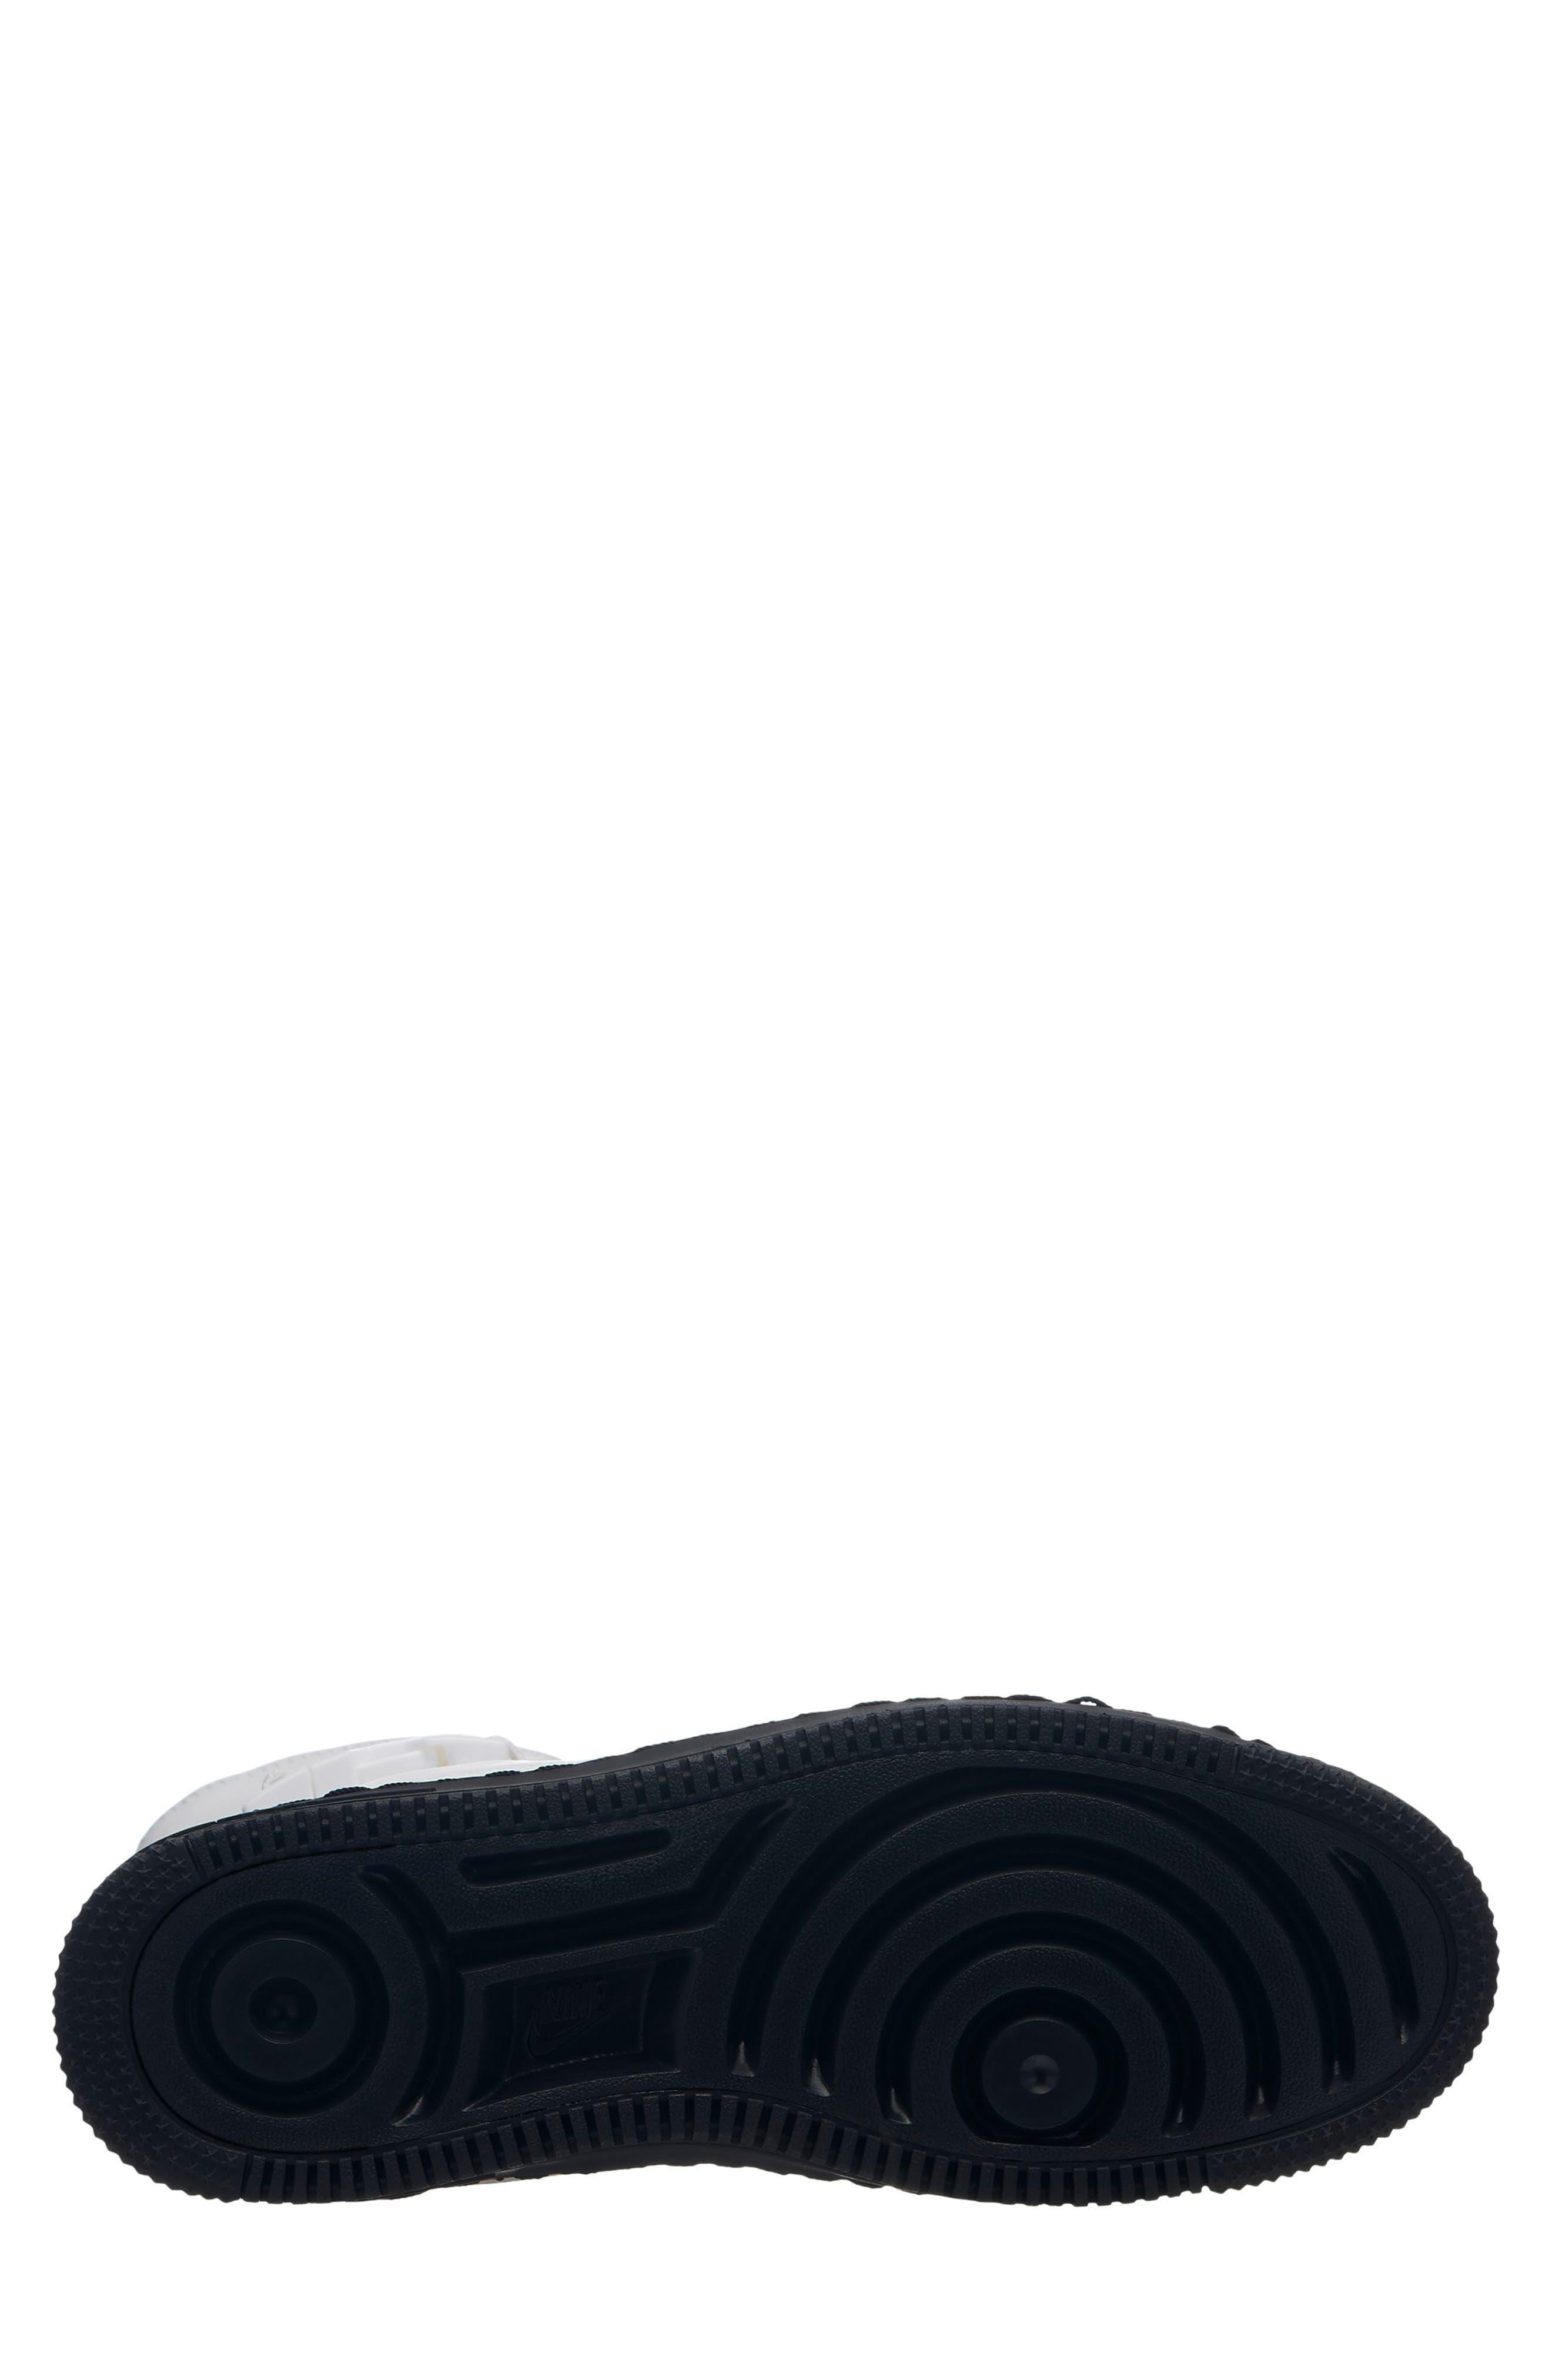 NIKE, Air Force 1 Sage High Platform Sneaker, Alternate thumbnail 2, color, WHITE/ WHITE/ BLACK